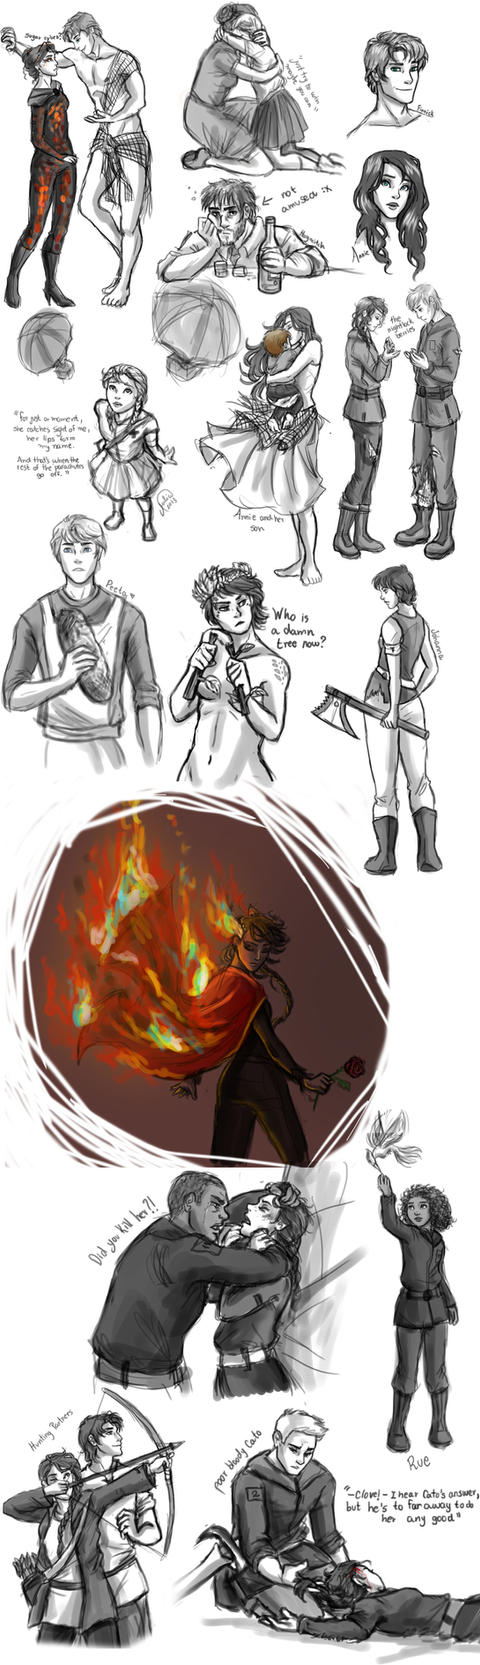 The Hunger Games Sketch Dump by juliajm15